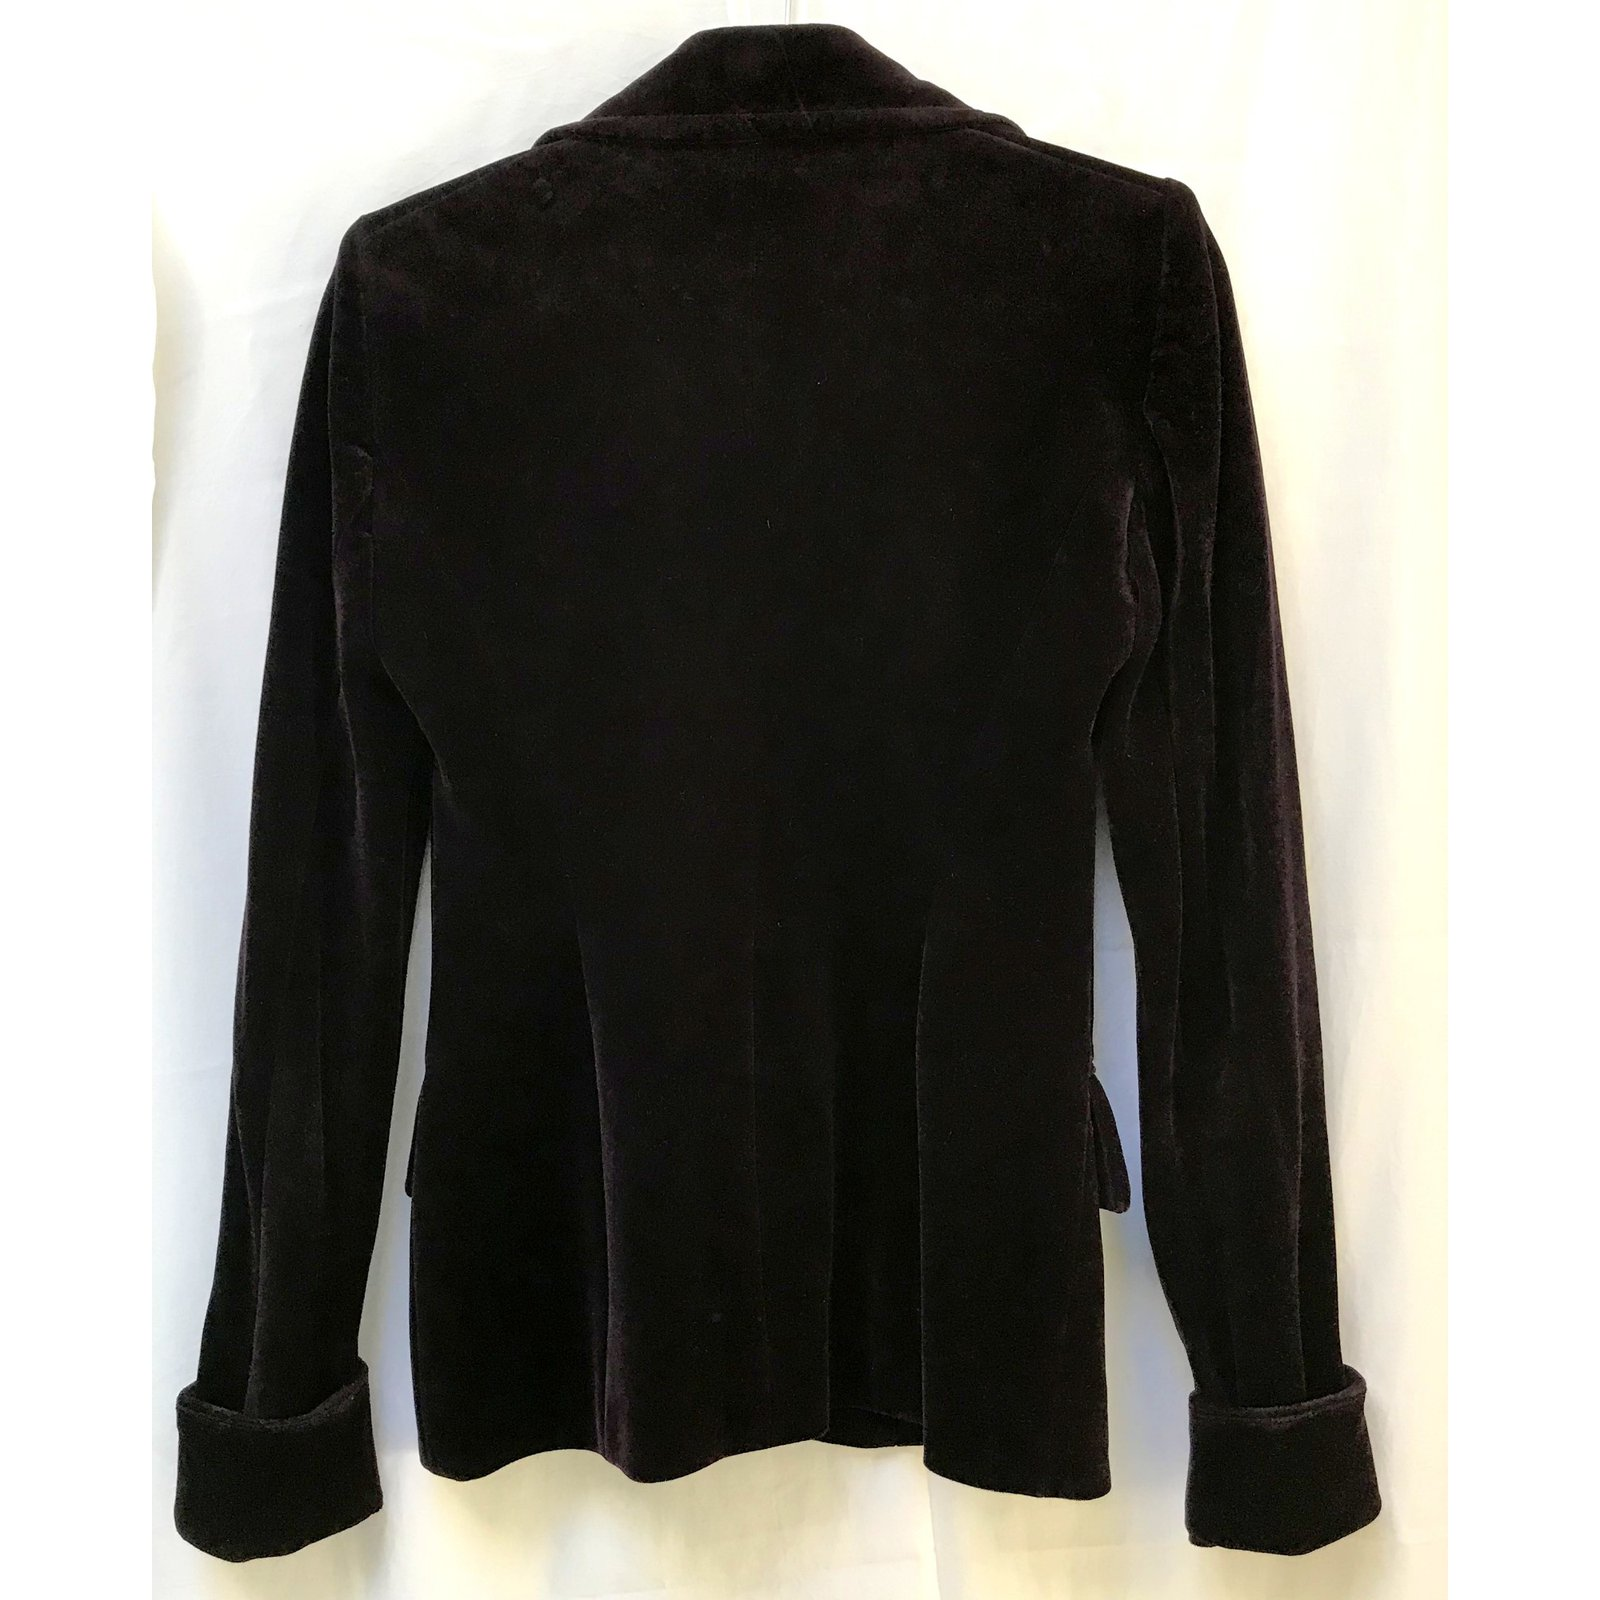 4a7fe24b7f4 Yves Saint Laurent Jacket Jackets Velvet Prune ref.84219 - Joli Closet